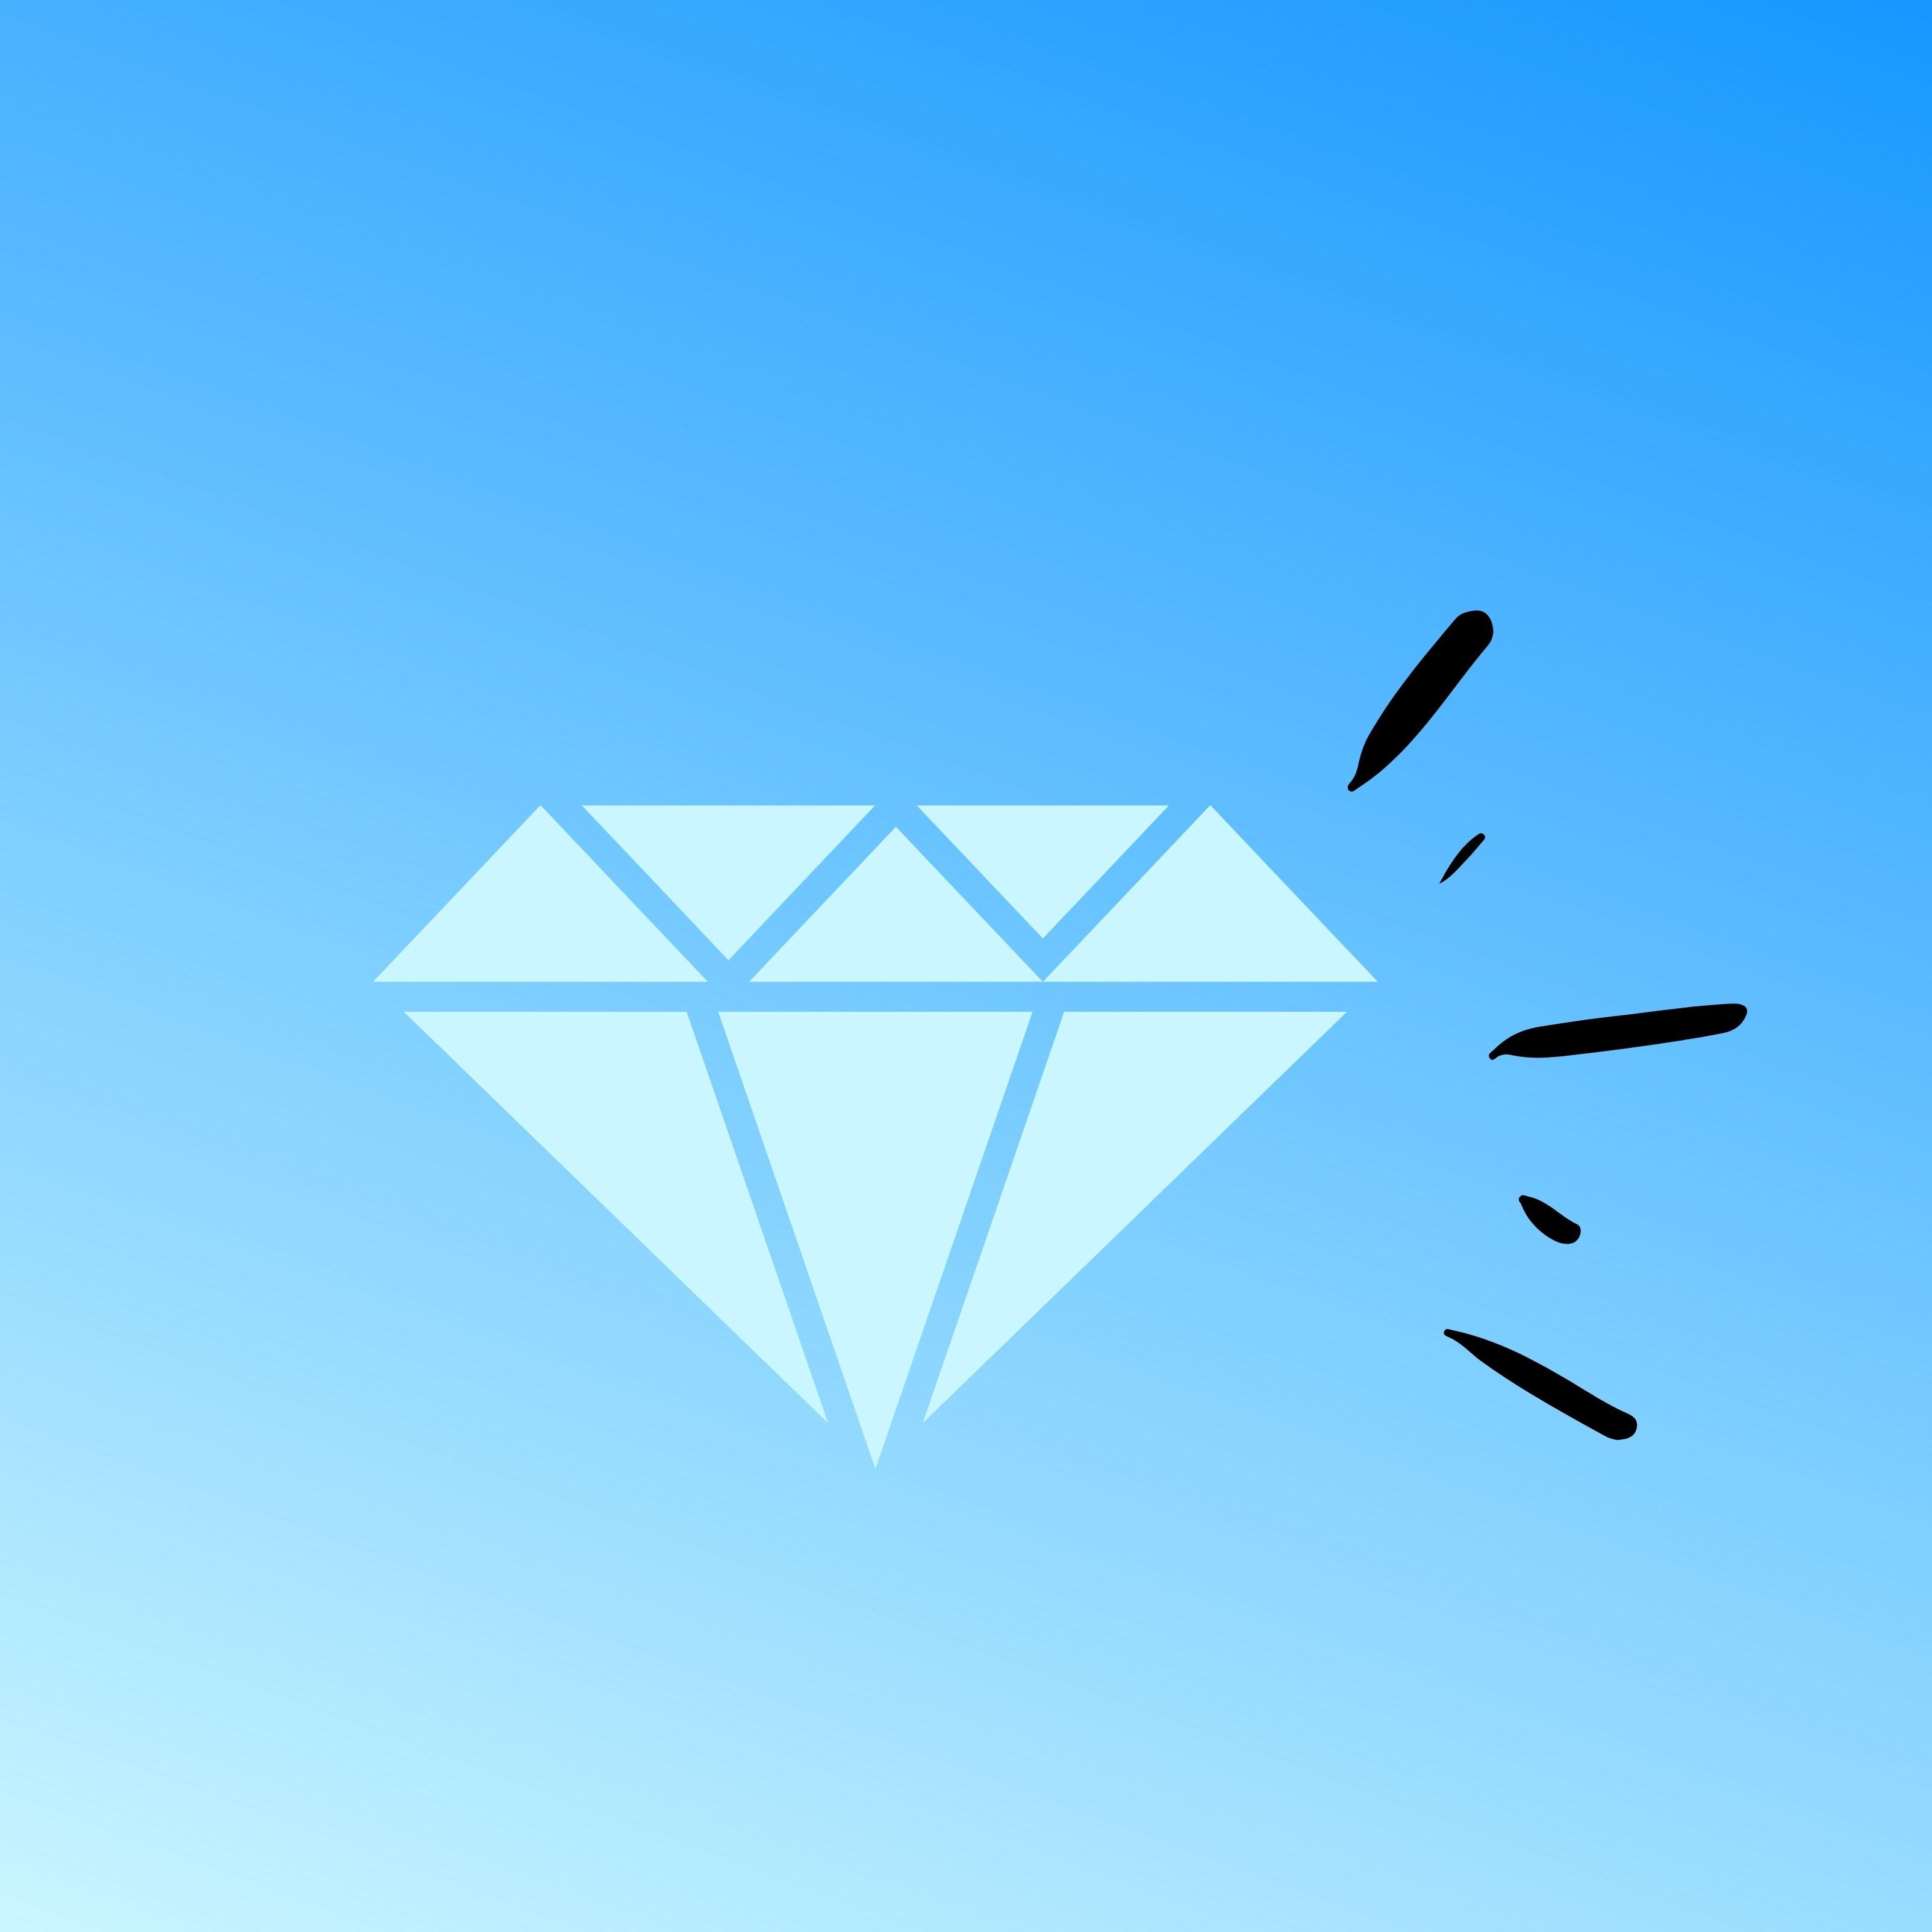 Diamond Crystal Gem Luxury Blue iPad Wallpaper